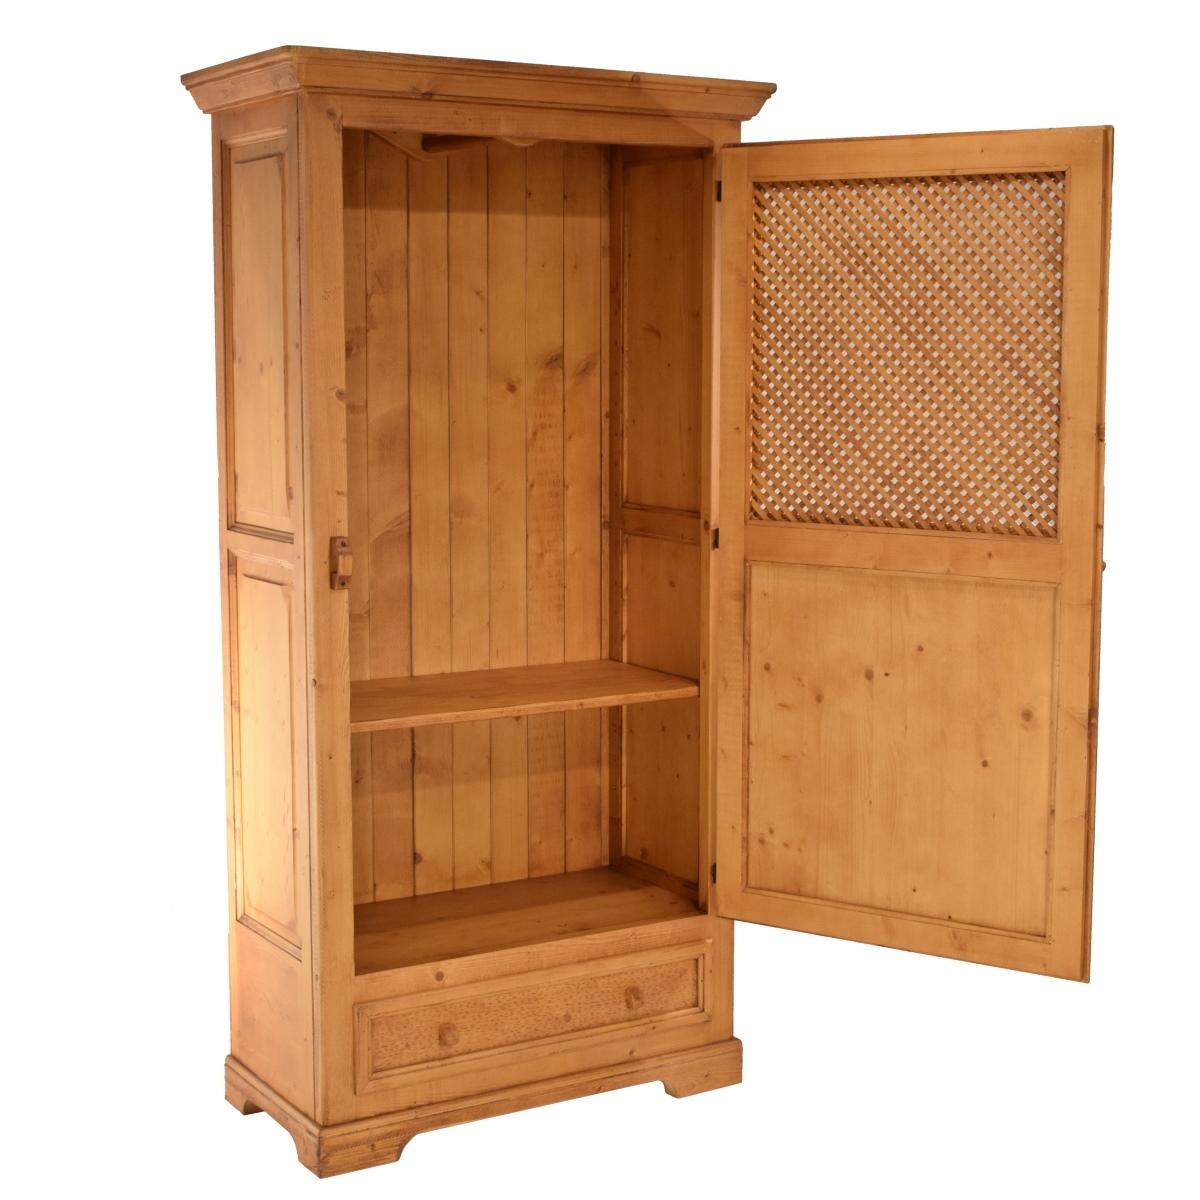 Armario recibidor r stico de madera ecor stico venta de - Armarios para recibidor ...